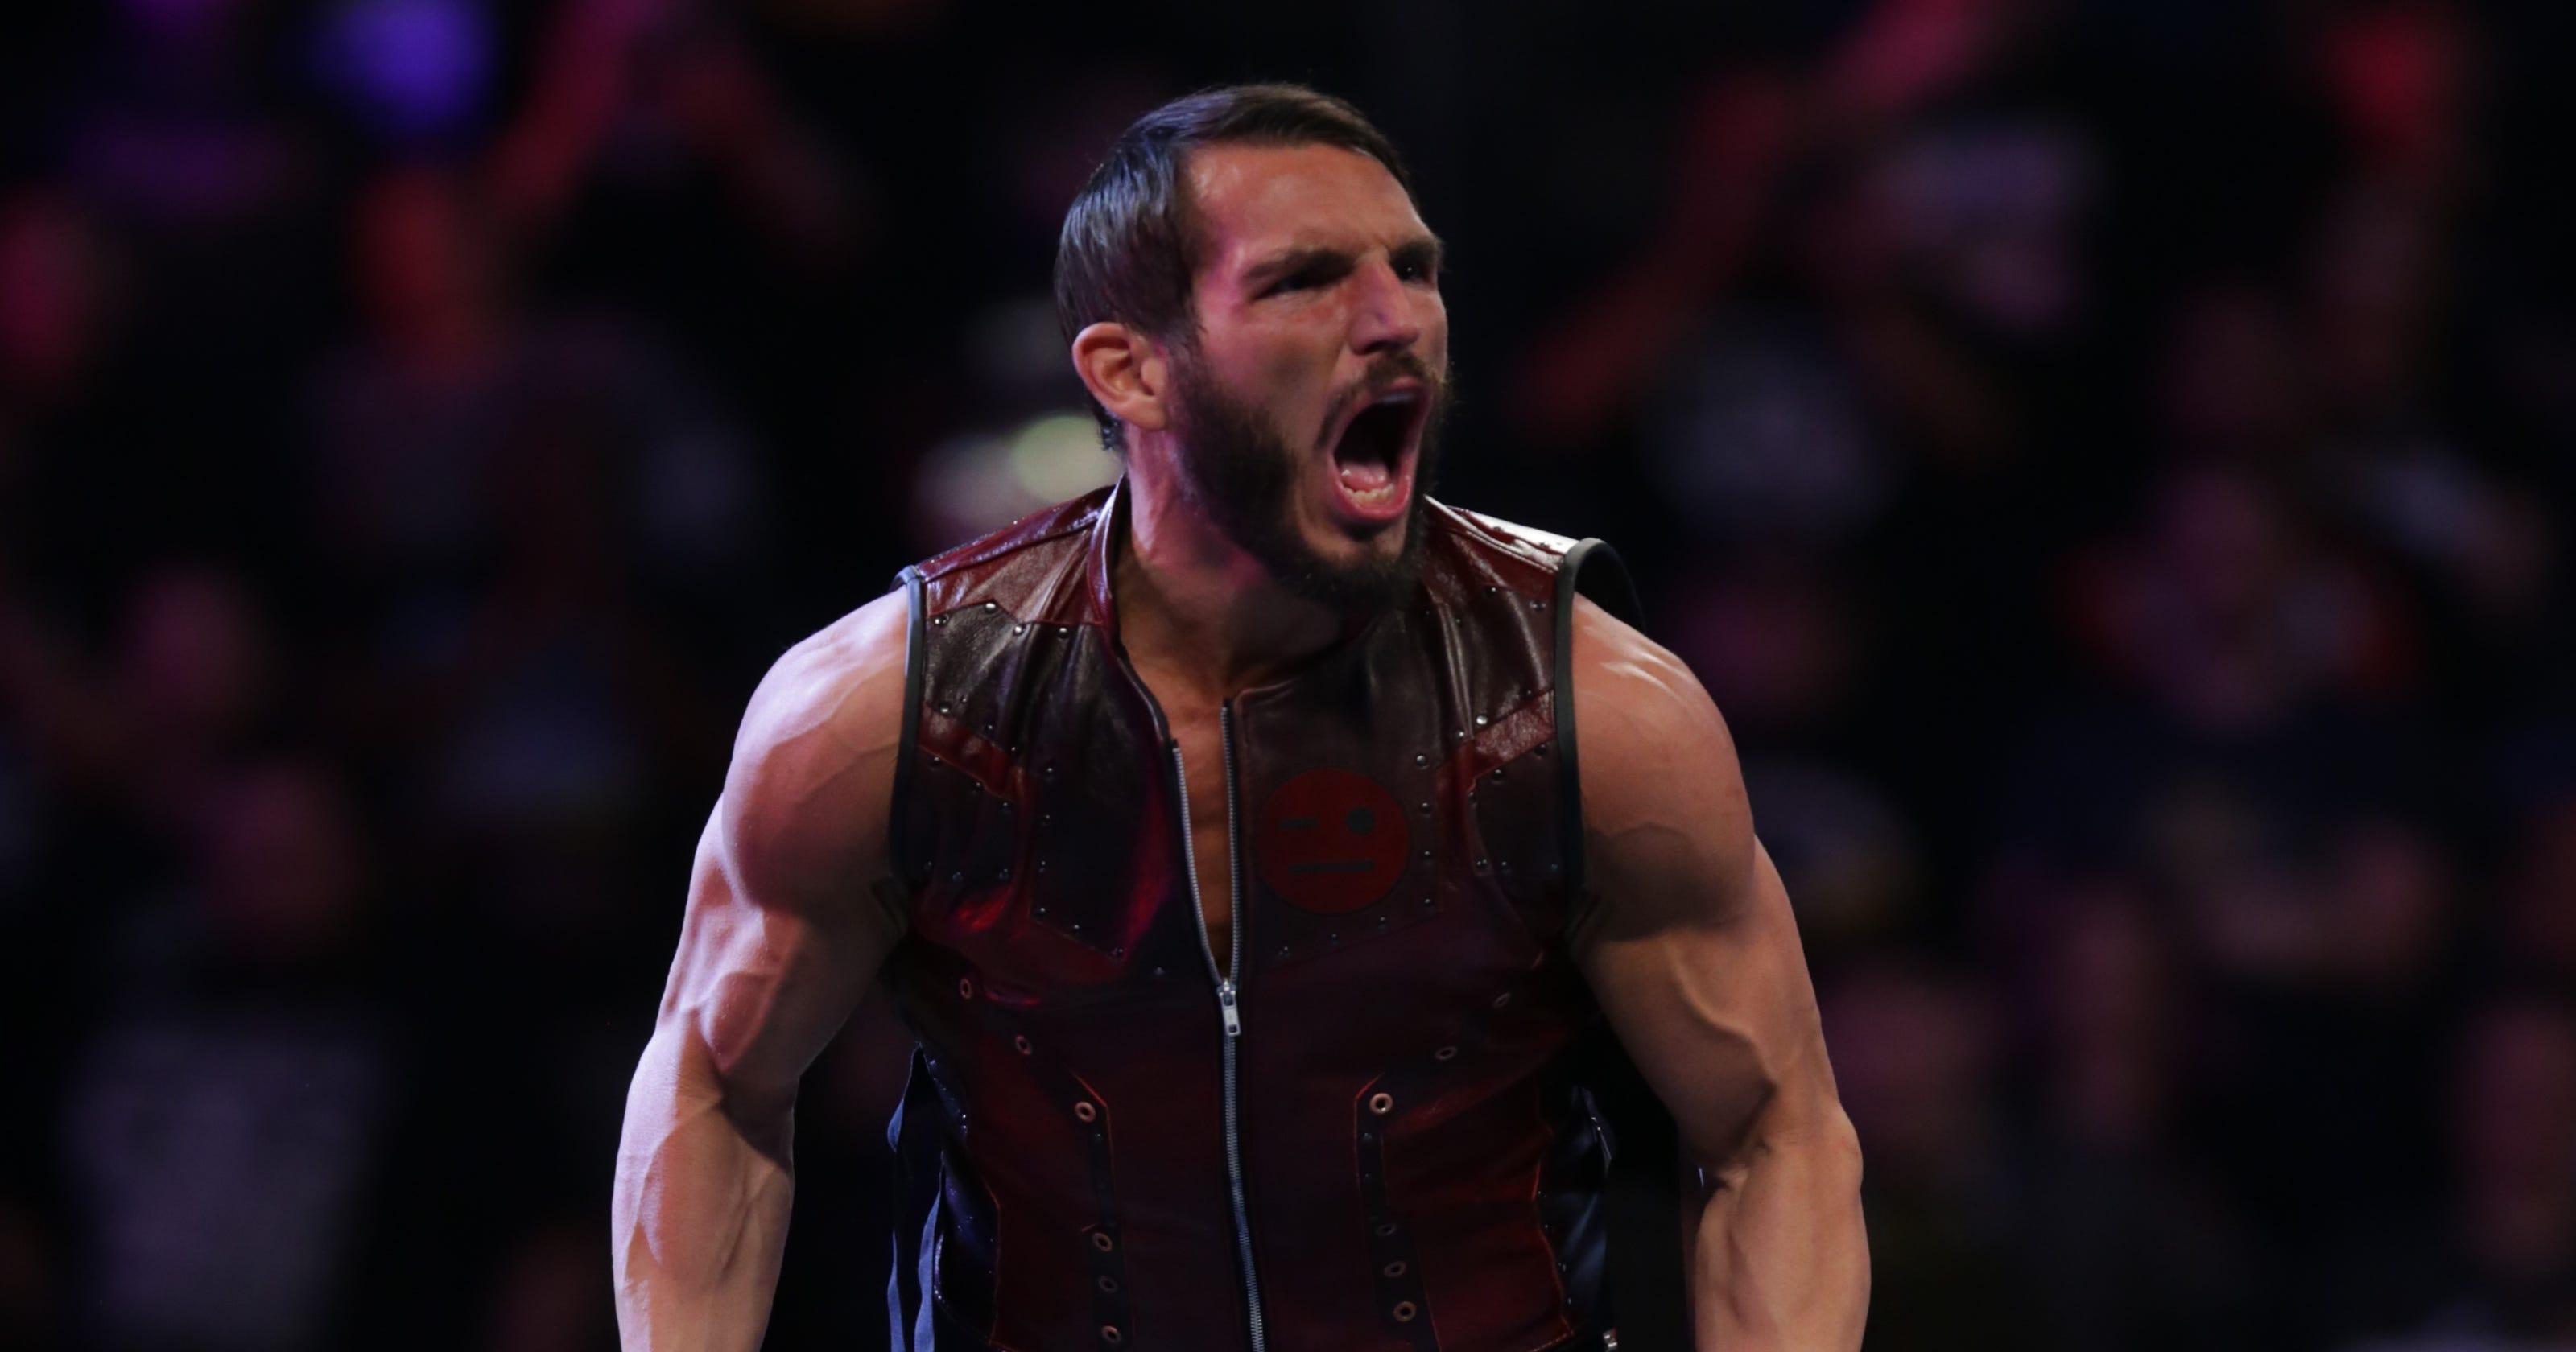 0756009f0 WWE NXT star Johnny Gargano: I'm a total nerd